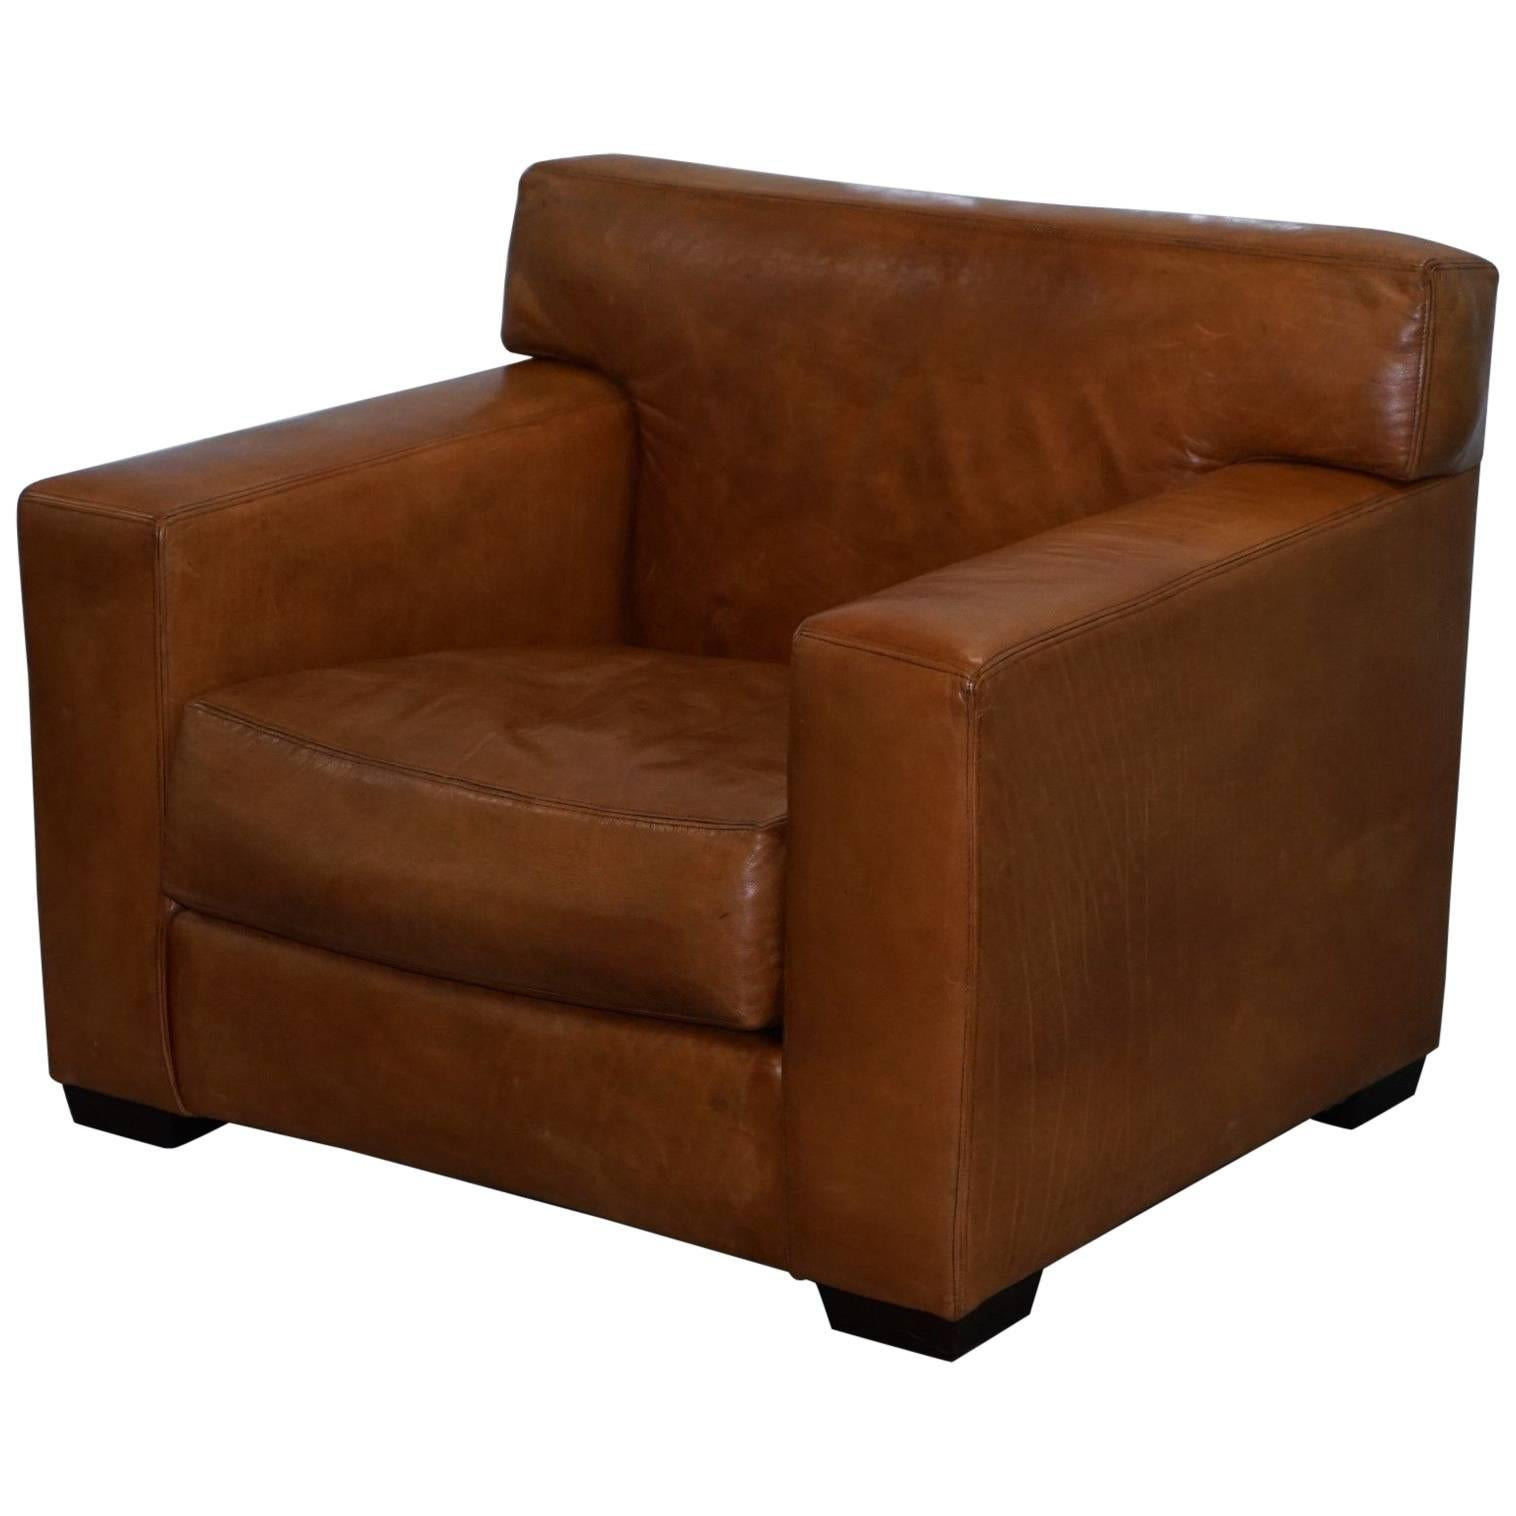 tan leather chair sale wedding covers shropshire ralph lauren graham club armchair brown custom buffalo for